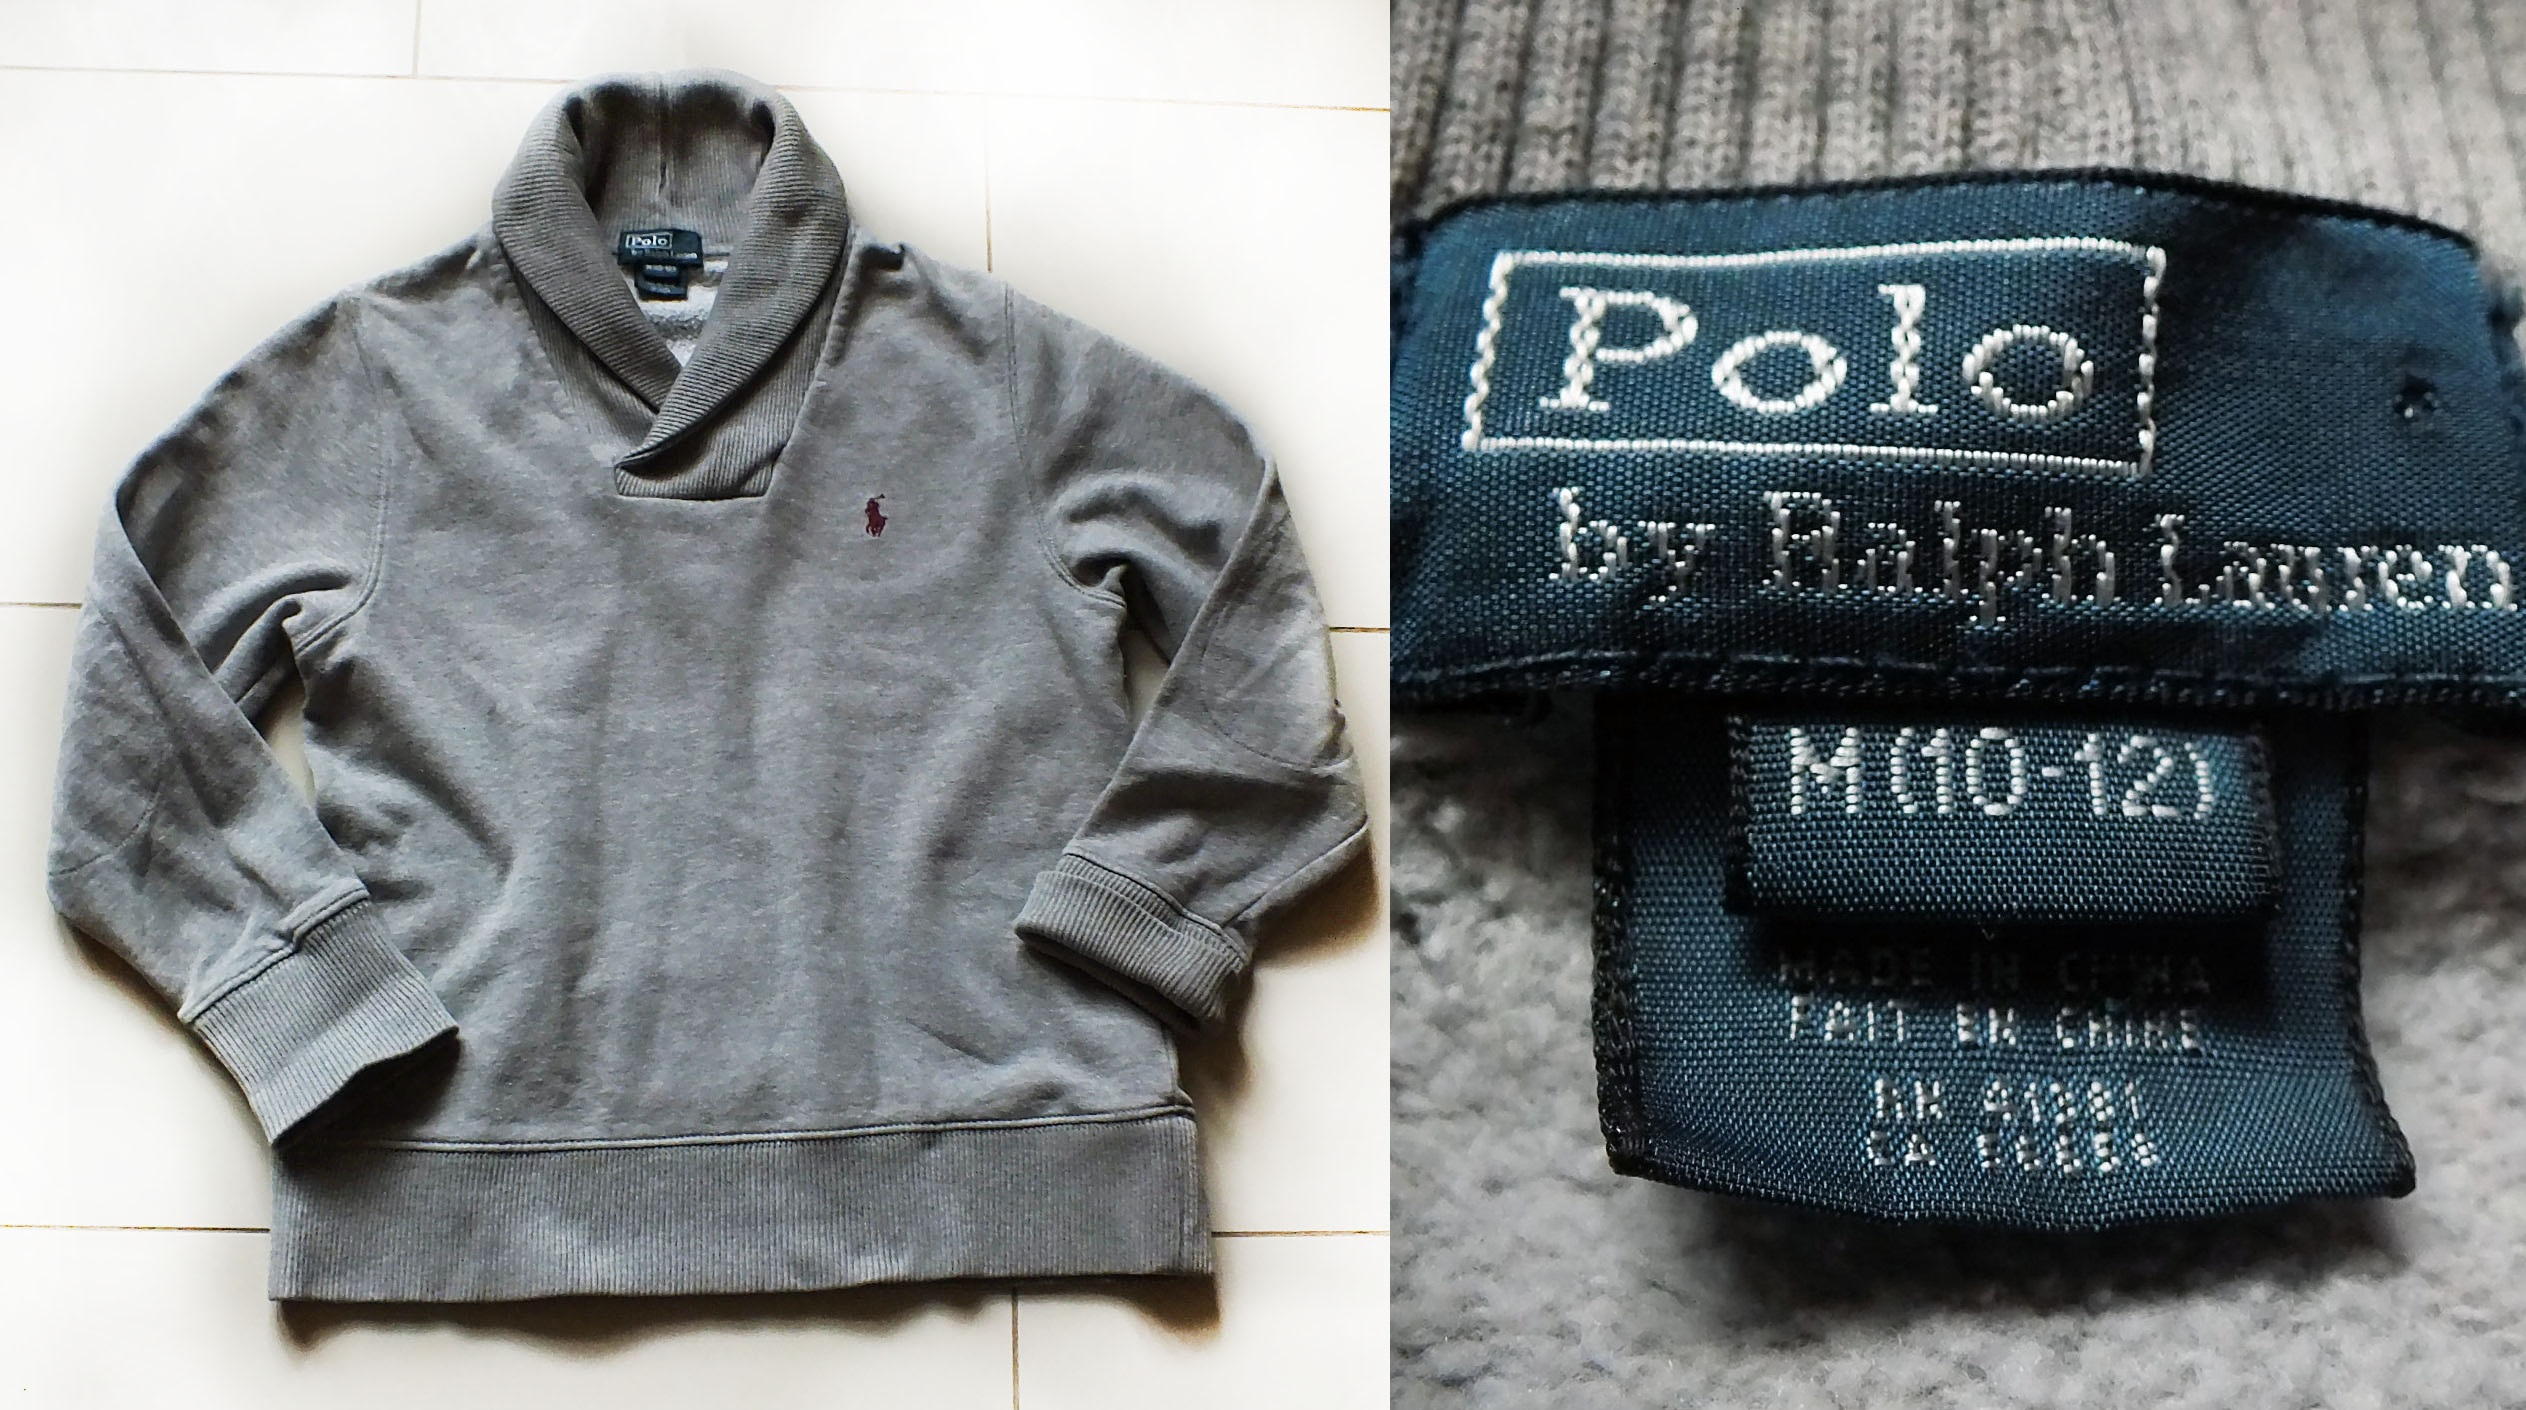 018349c5a POLO by RALPH LAUREN fajna bluza bawełniana 10/12L - 7313017689 ...